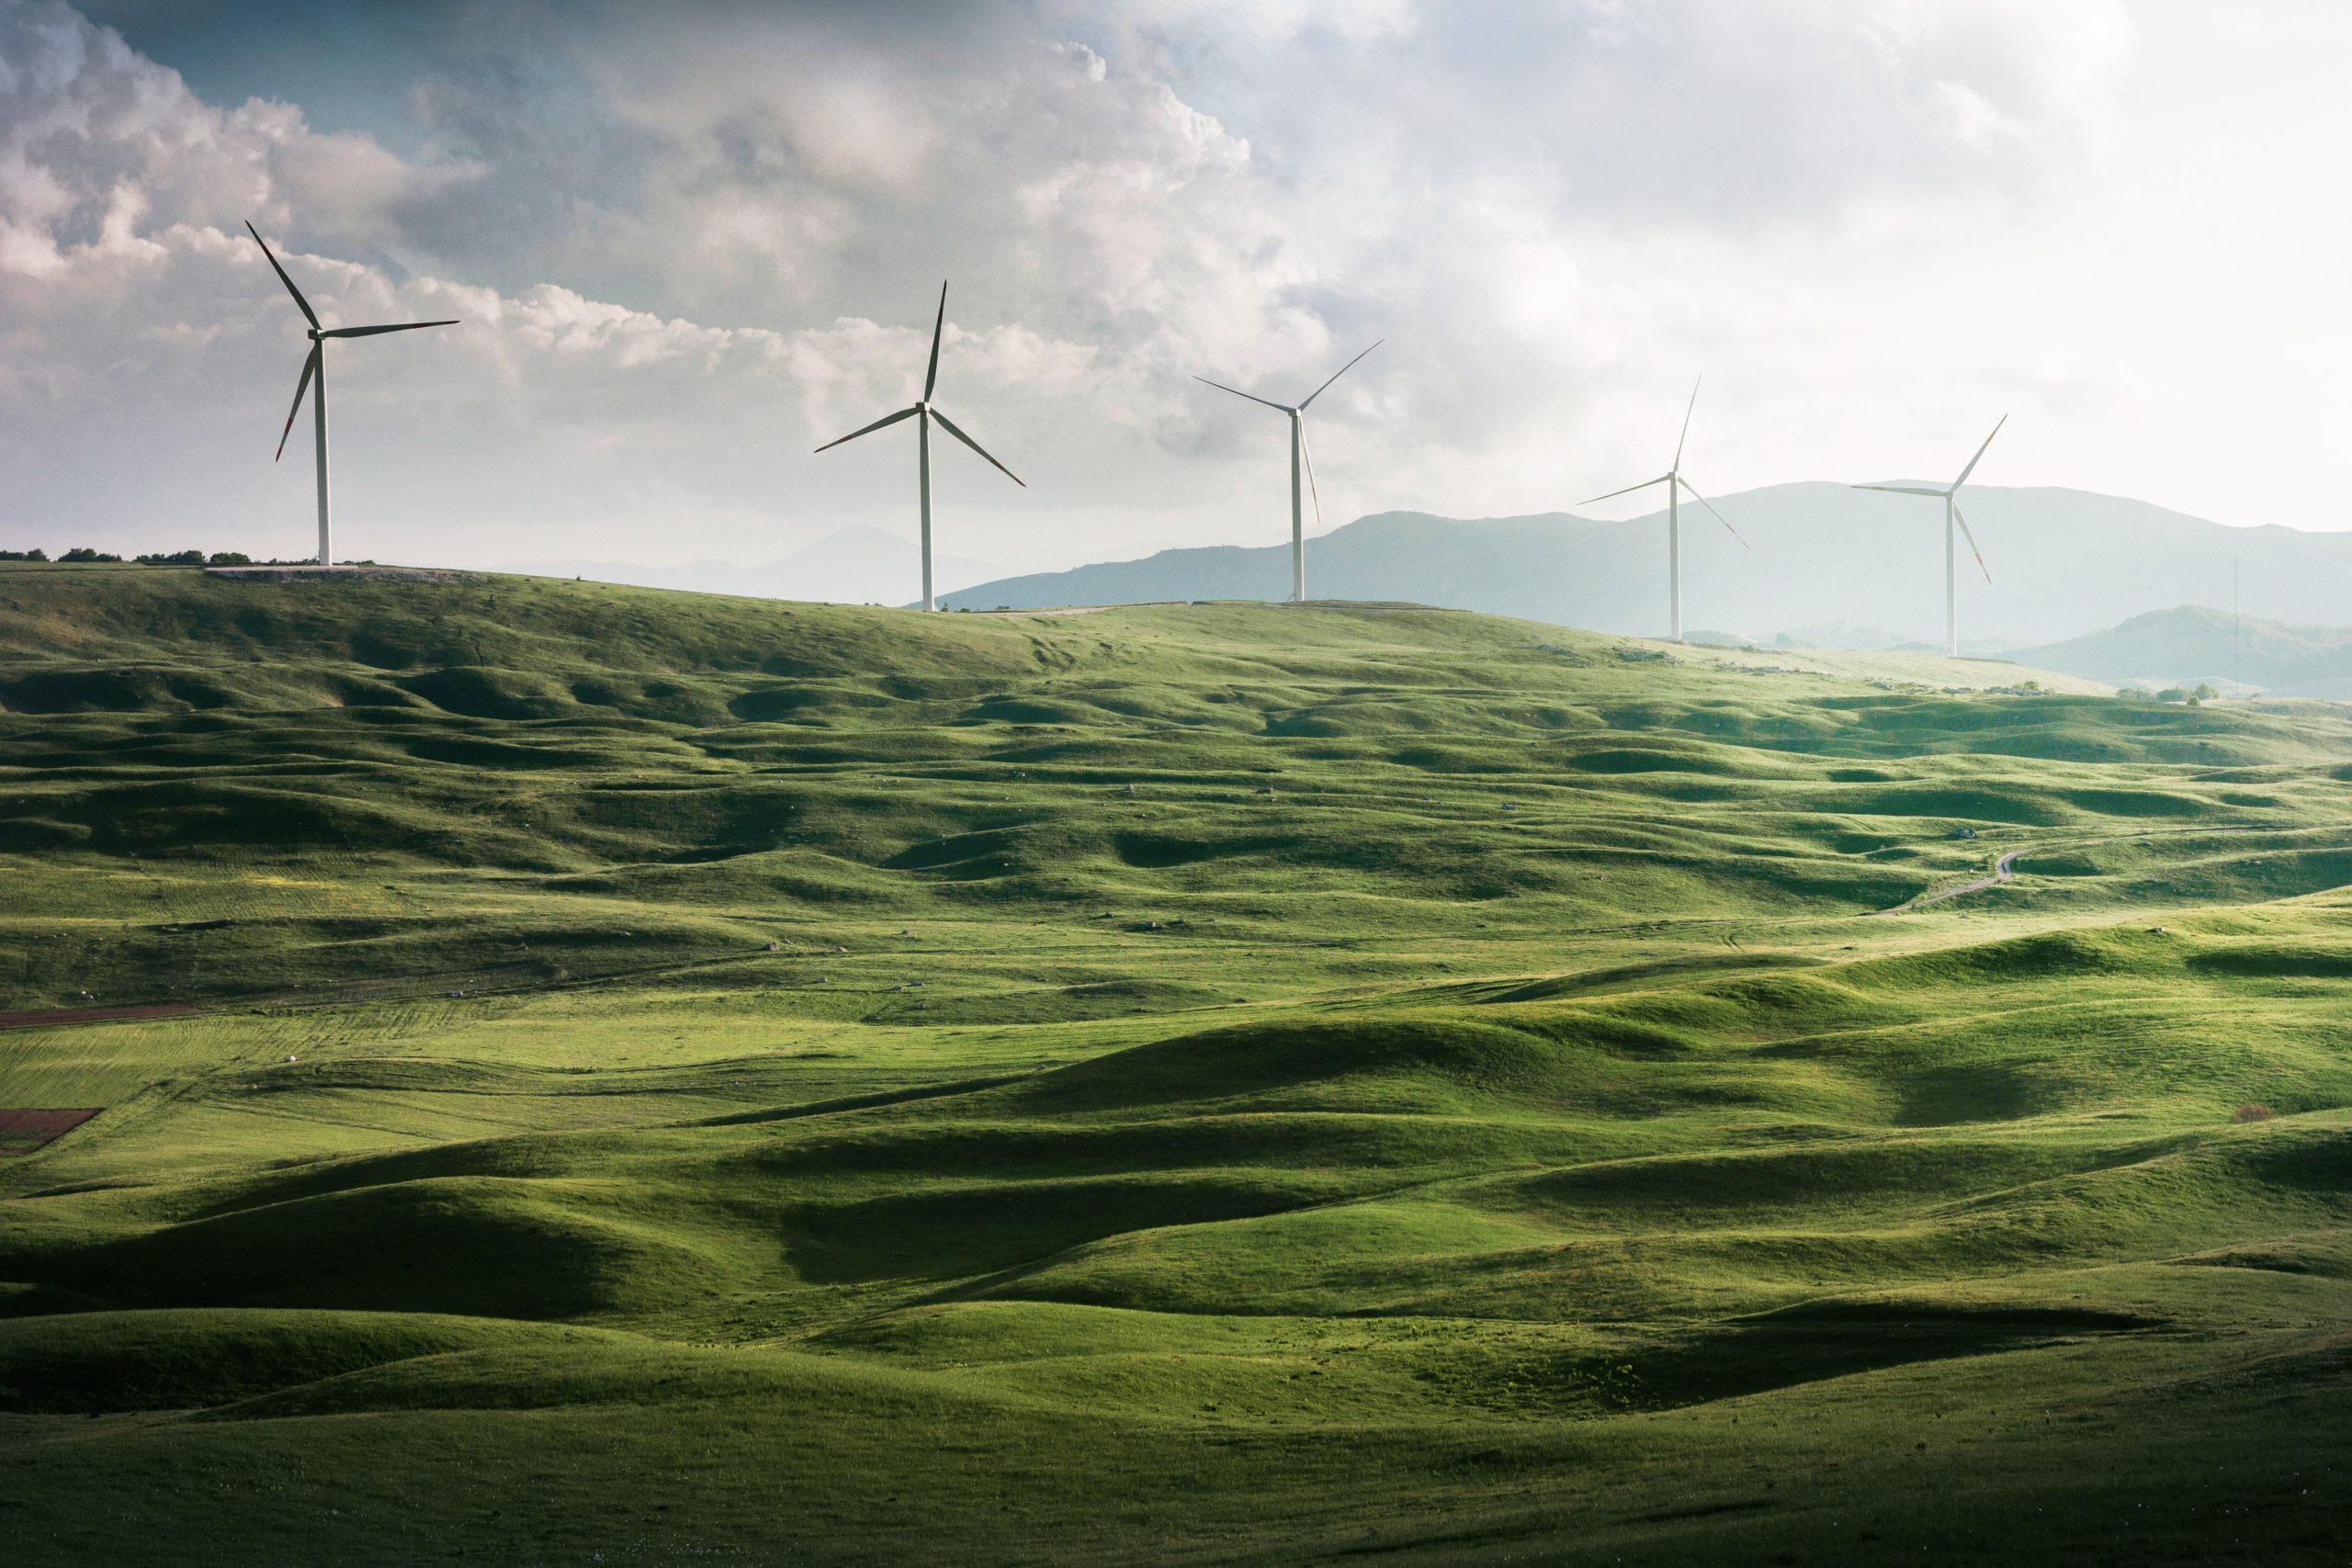 Aerogenerador vertical de energía eólica green visa